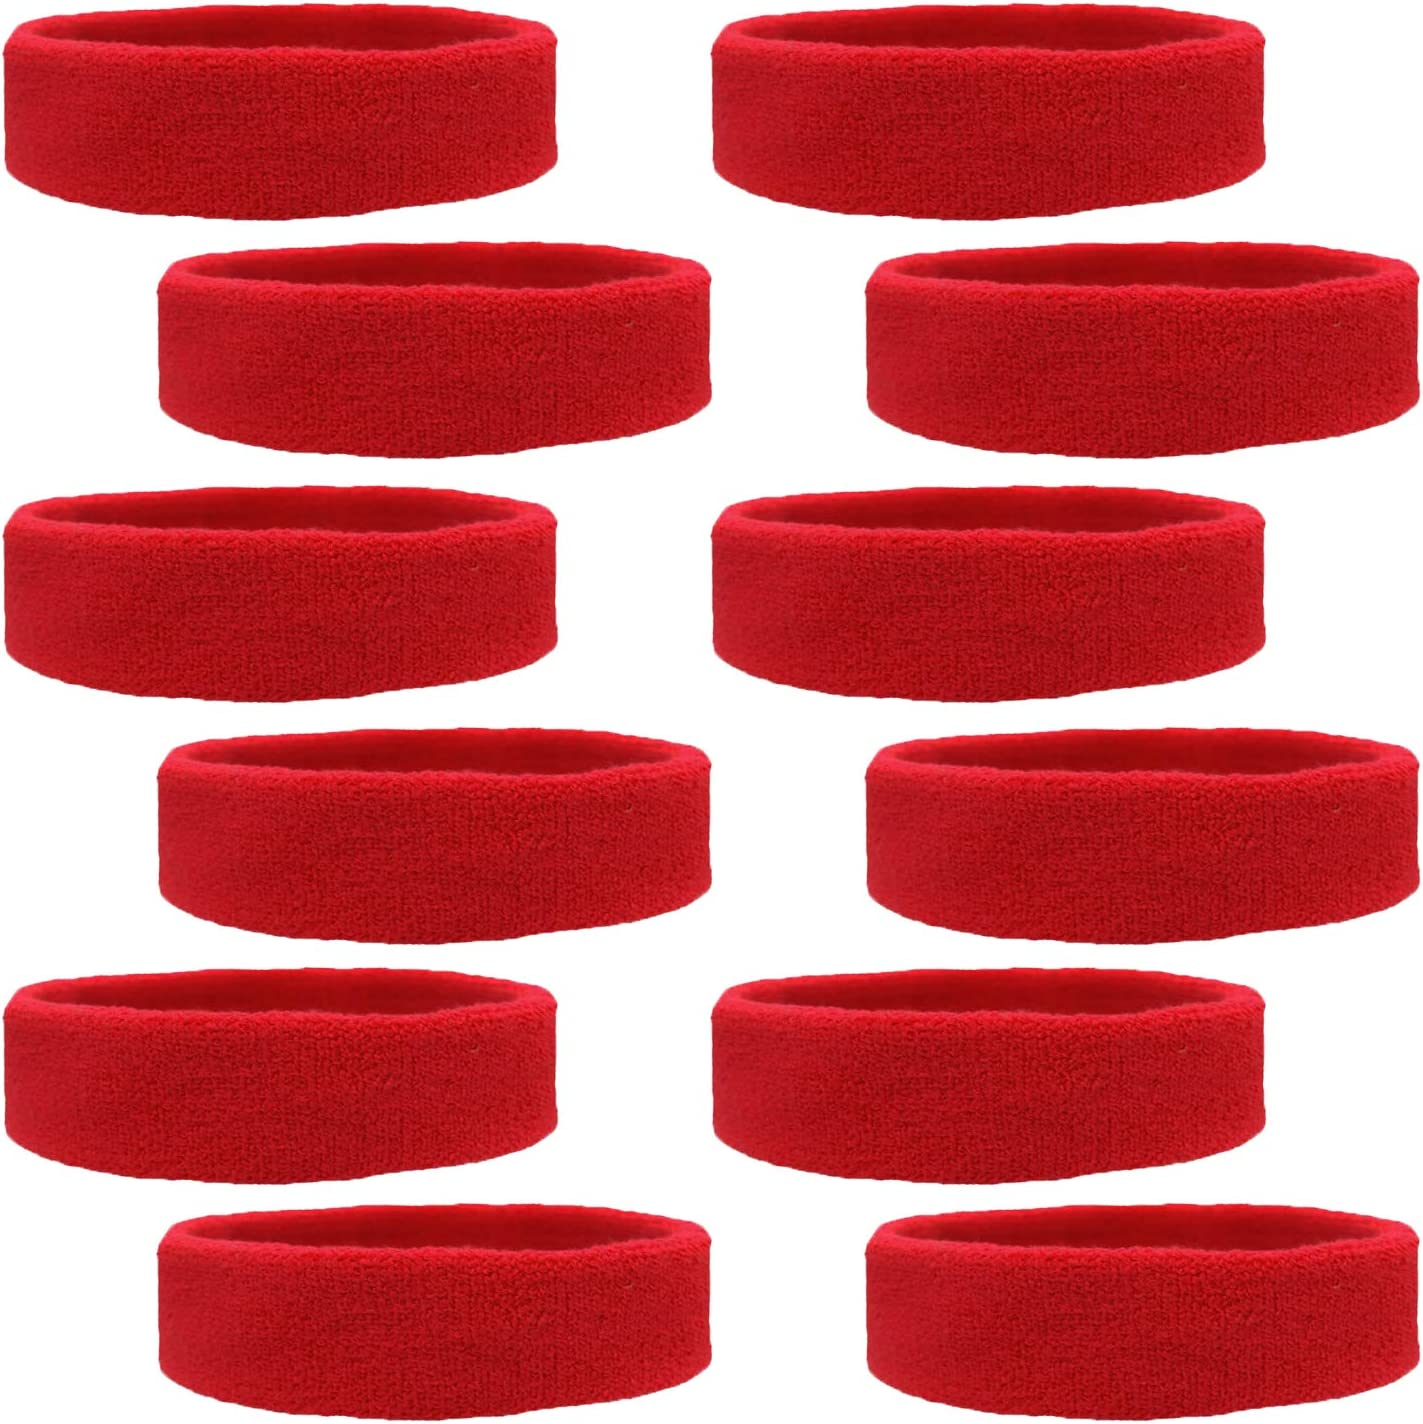 Kenz Laurenz 12 Sweatbands Cotton Sports Headbands Terry Cloth Moisture Wicking Athletic Basketball Headband